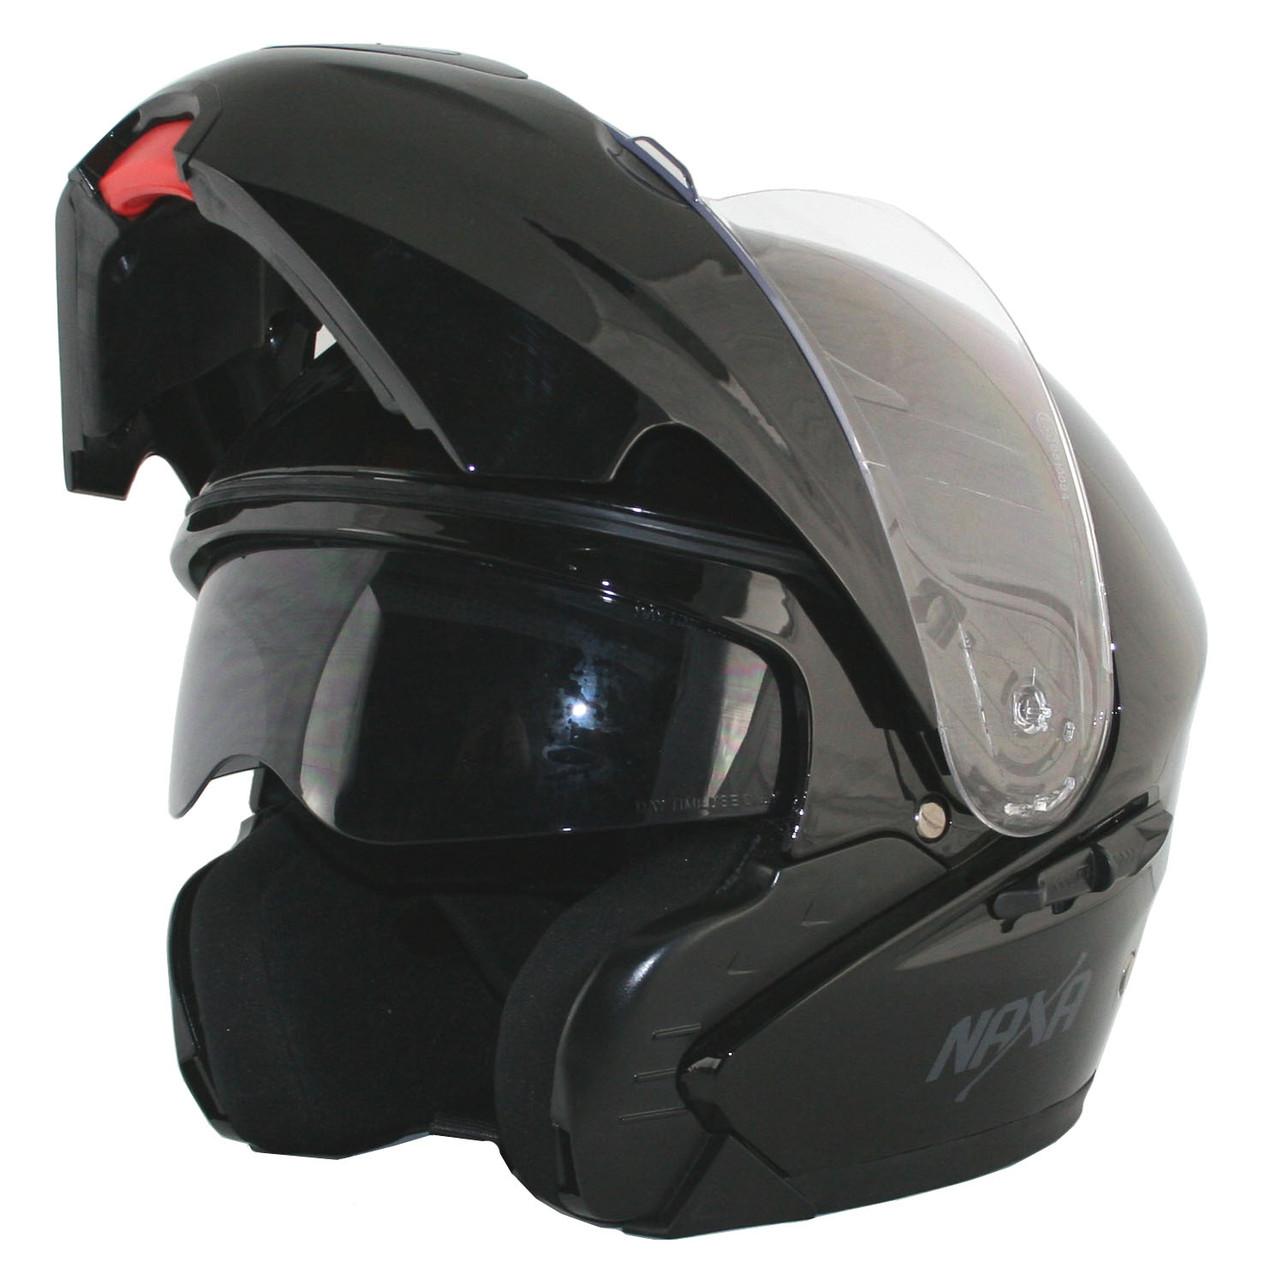 Мотоциклетный шлем NAXA FO2A r.XS + BLENDA